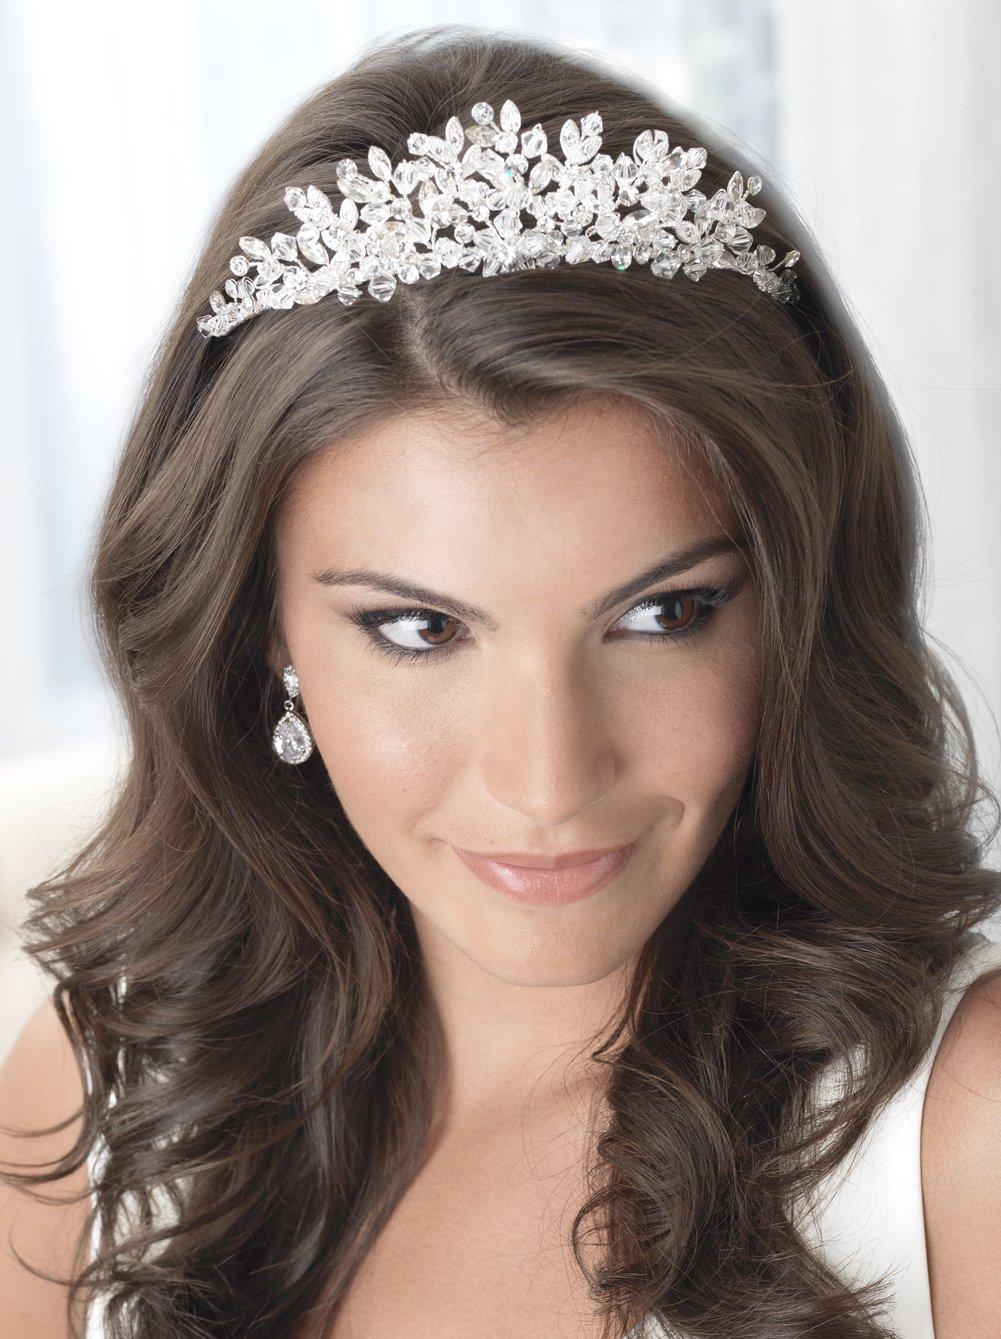 USABride Floral Rhinestone and Crystal Wedding Tiara, Special Occasion Headpiece 3233